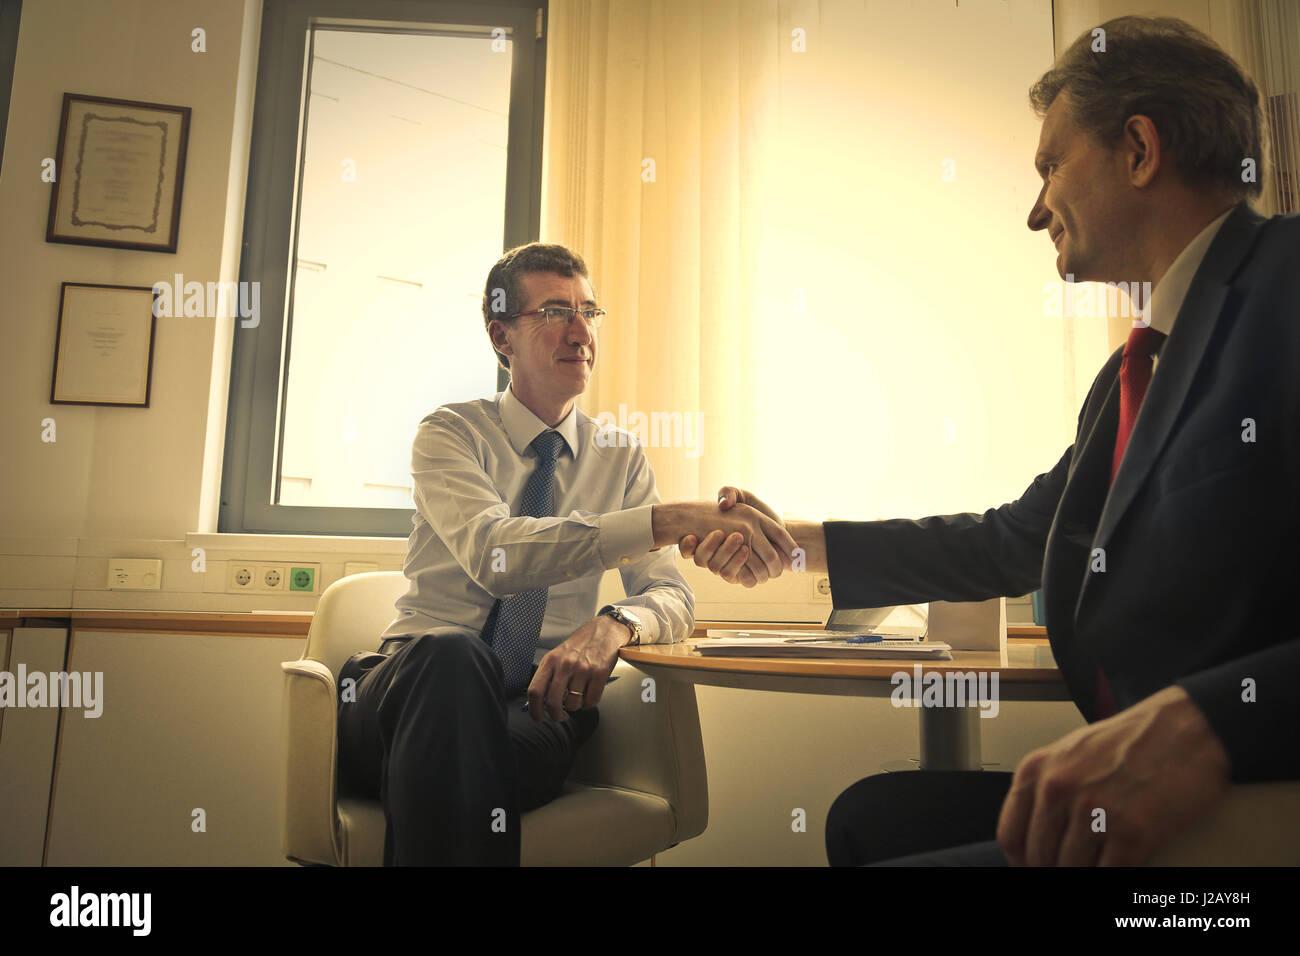 2 businessman shaking hands - Stock Image